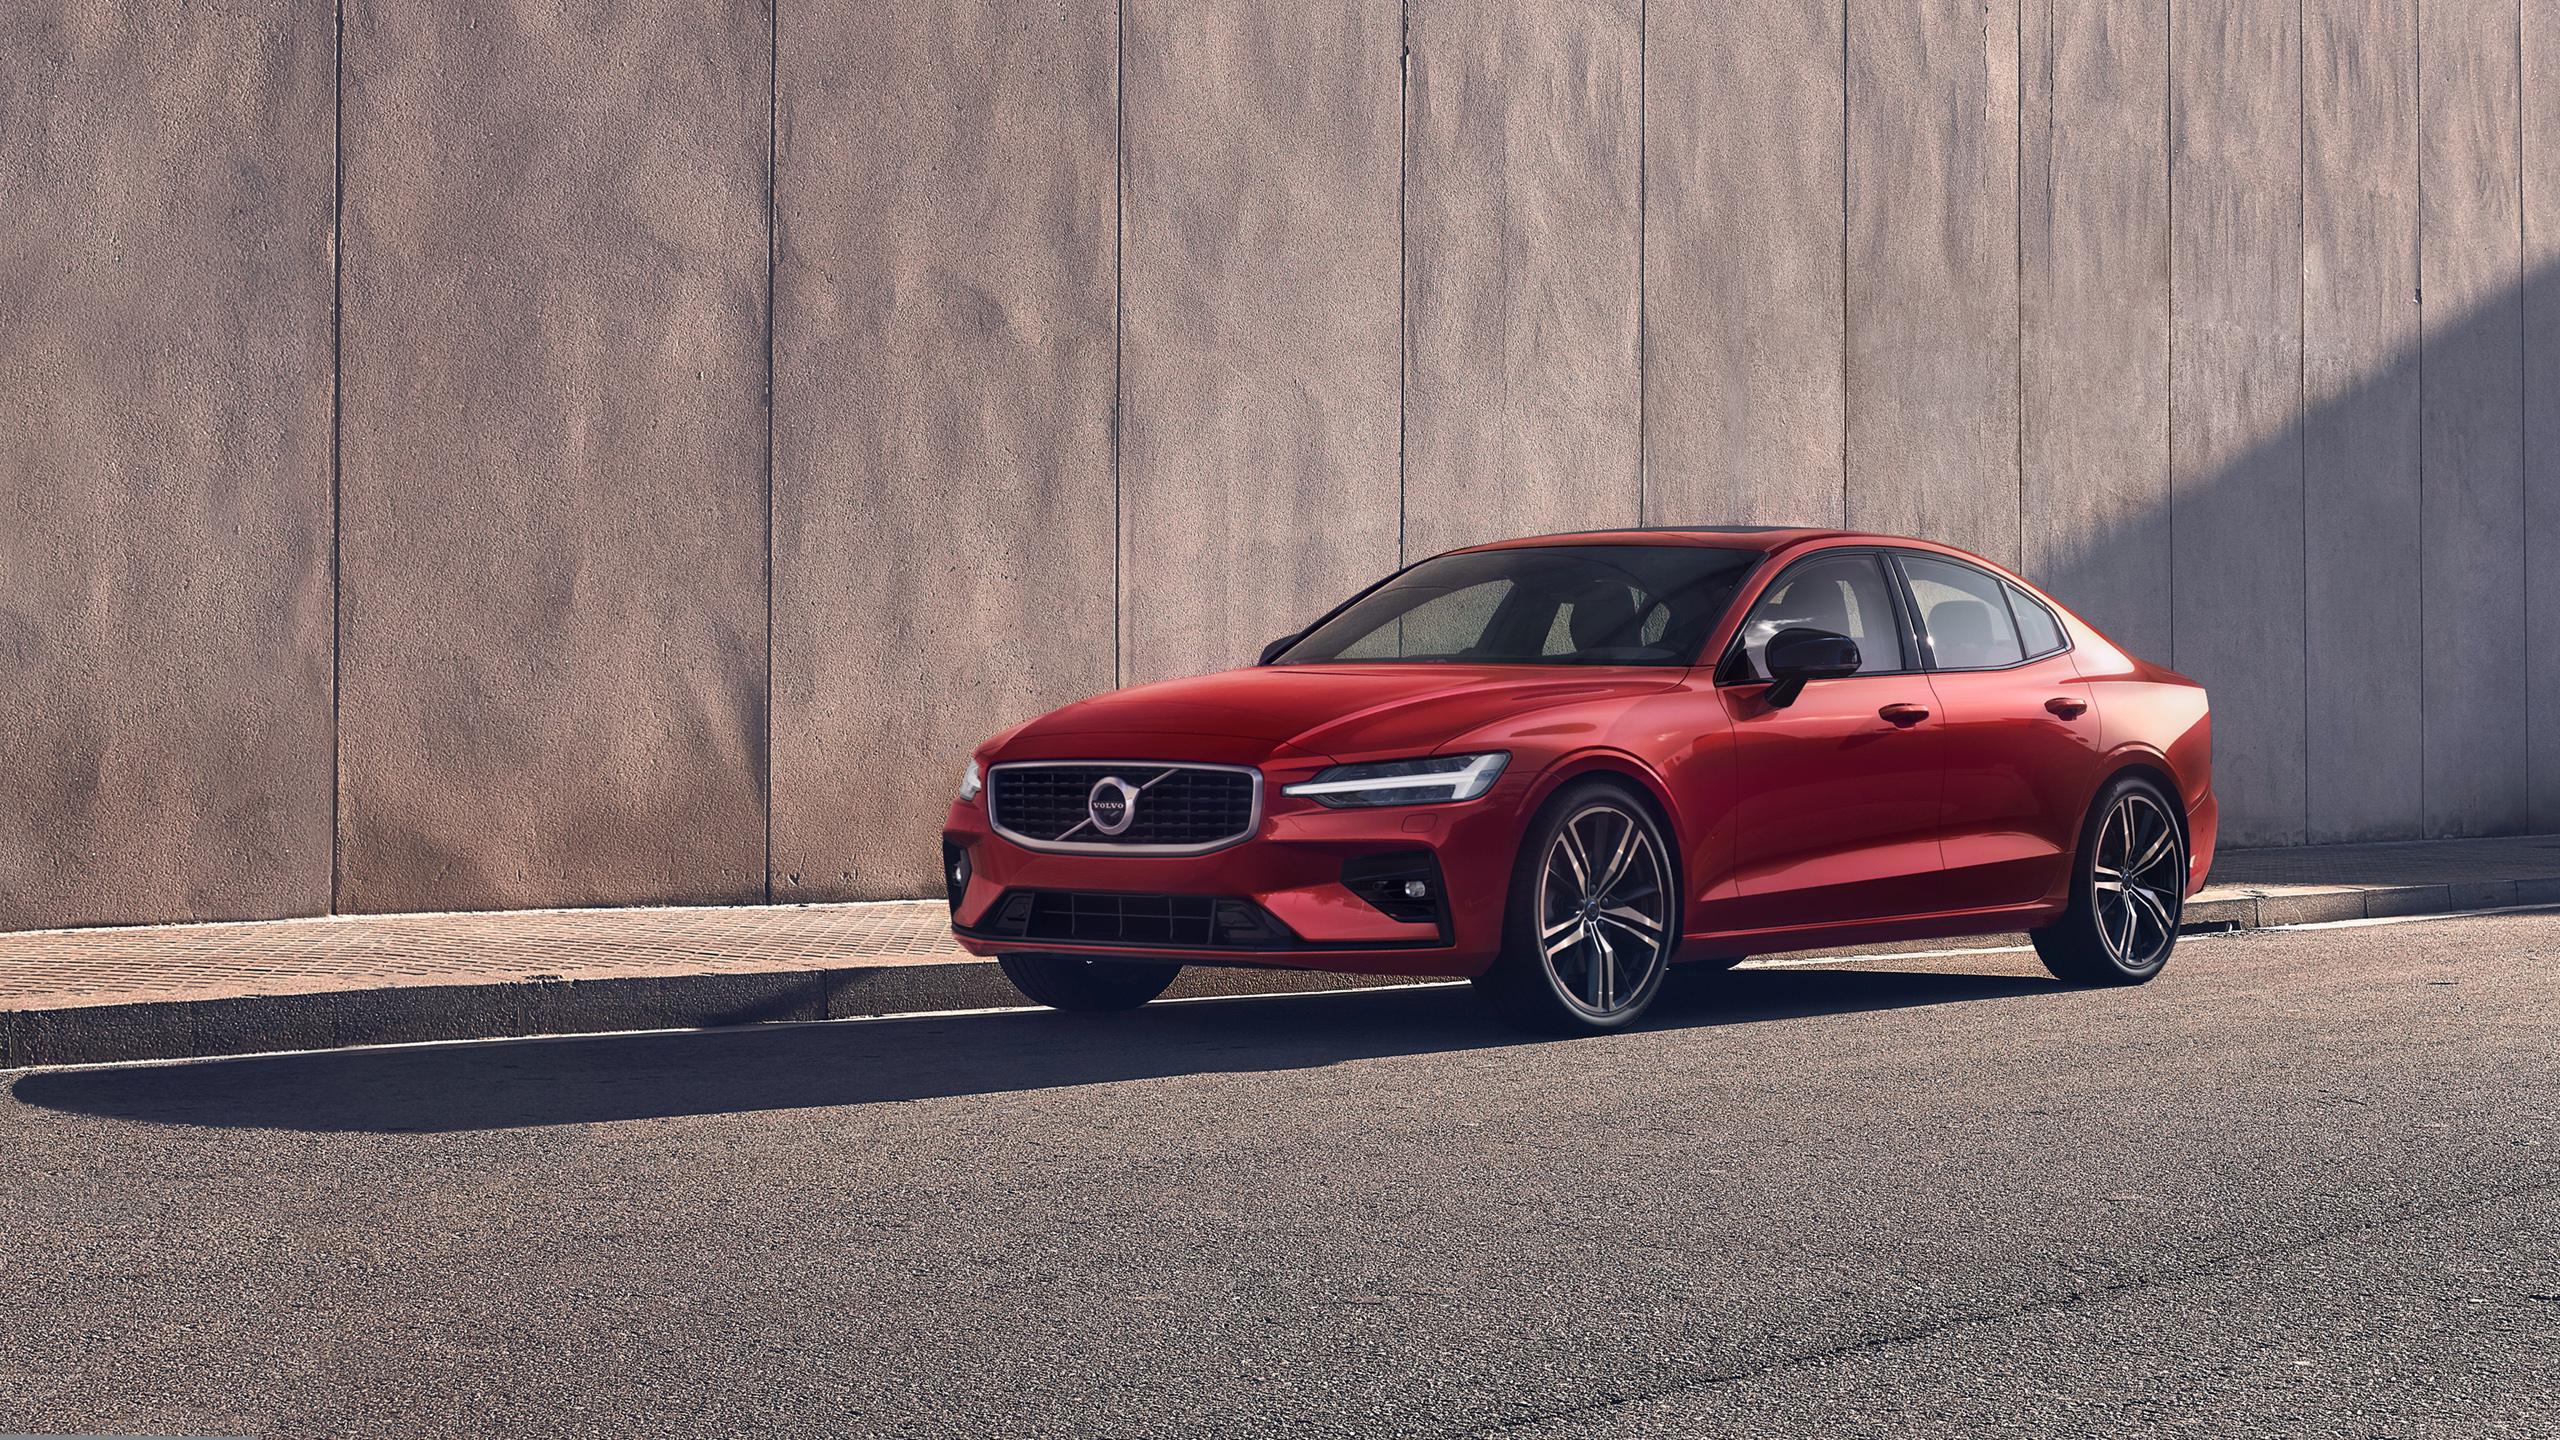 Volvo S60 T6 R Design 2018 Wallpaper HD Car Wallpapers ID 10690 2560x1440